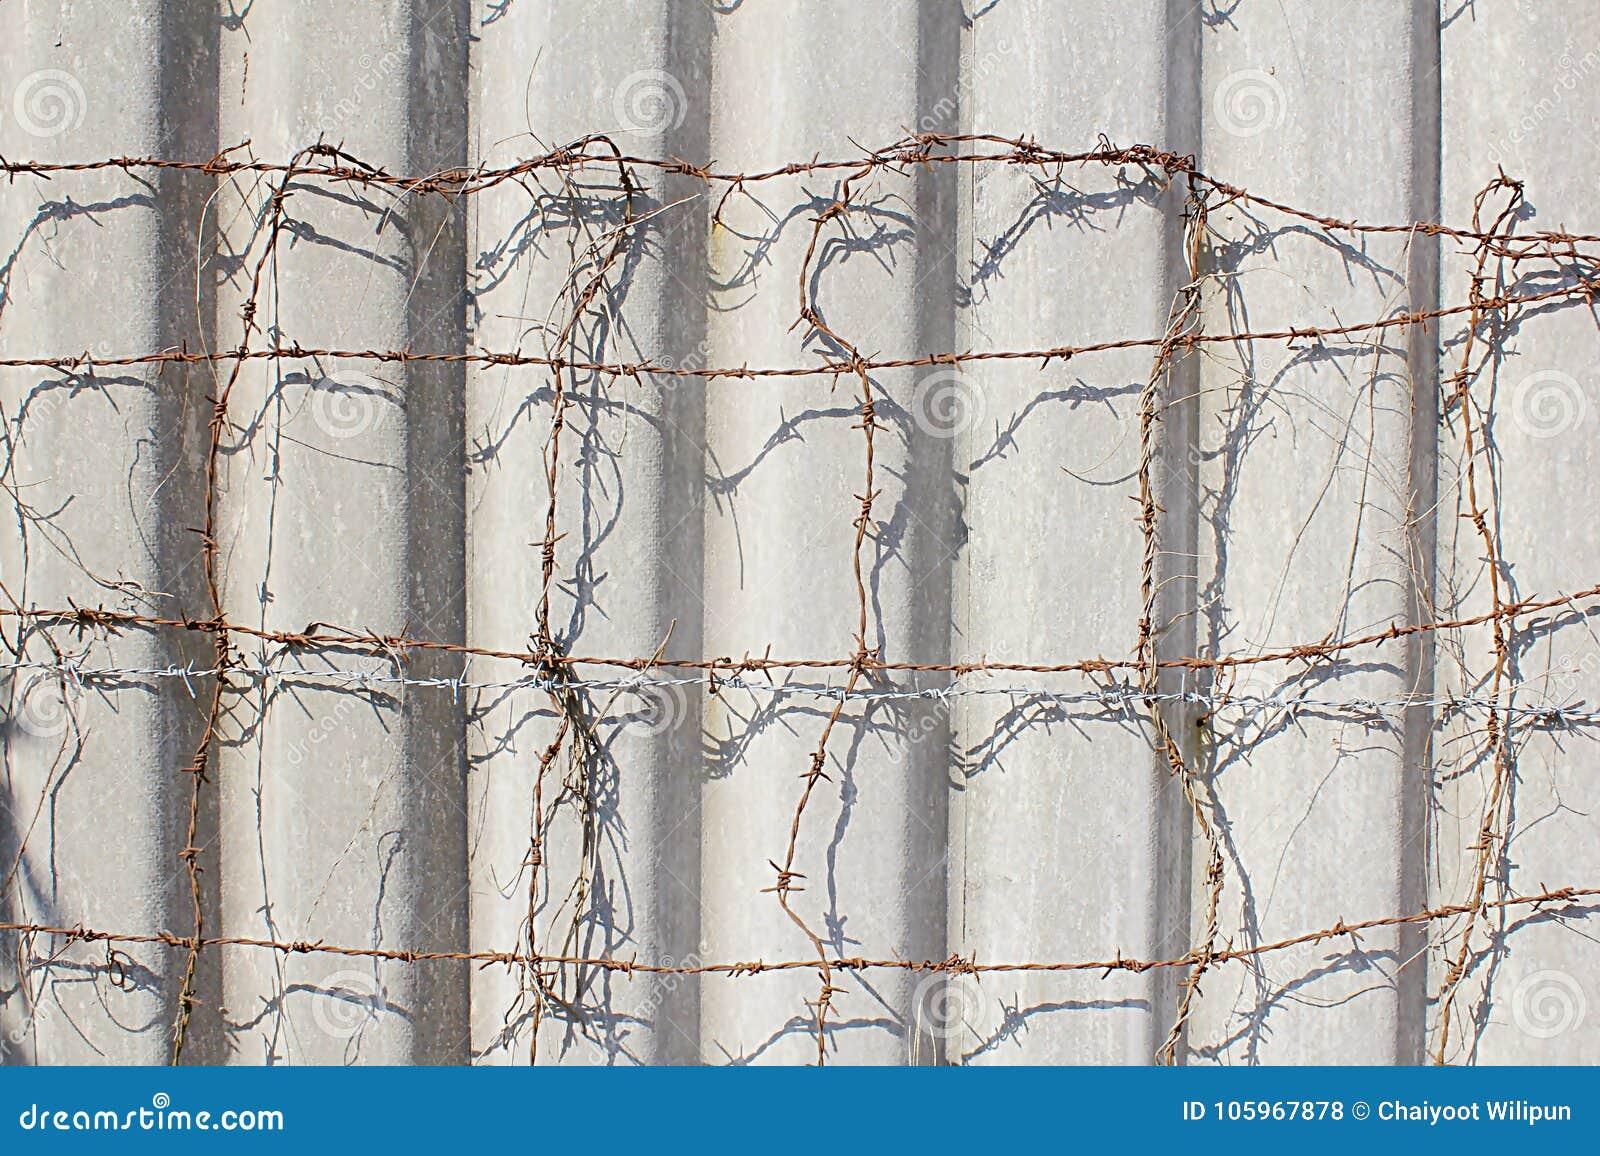 Dorable Chicken Wire Tomato Cage Ensign - Electrical Diagram Ideas ...